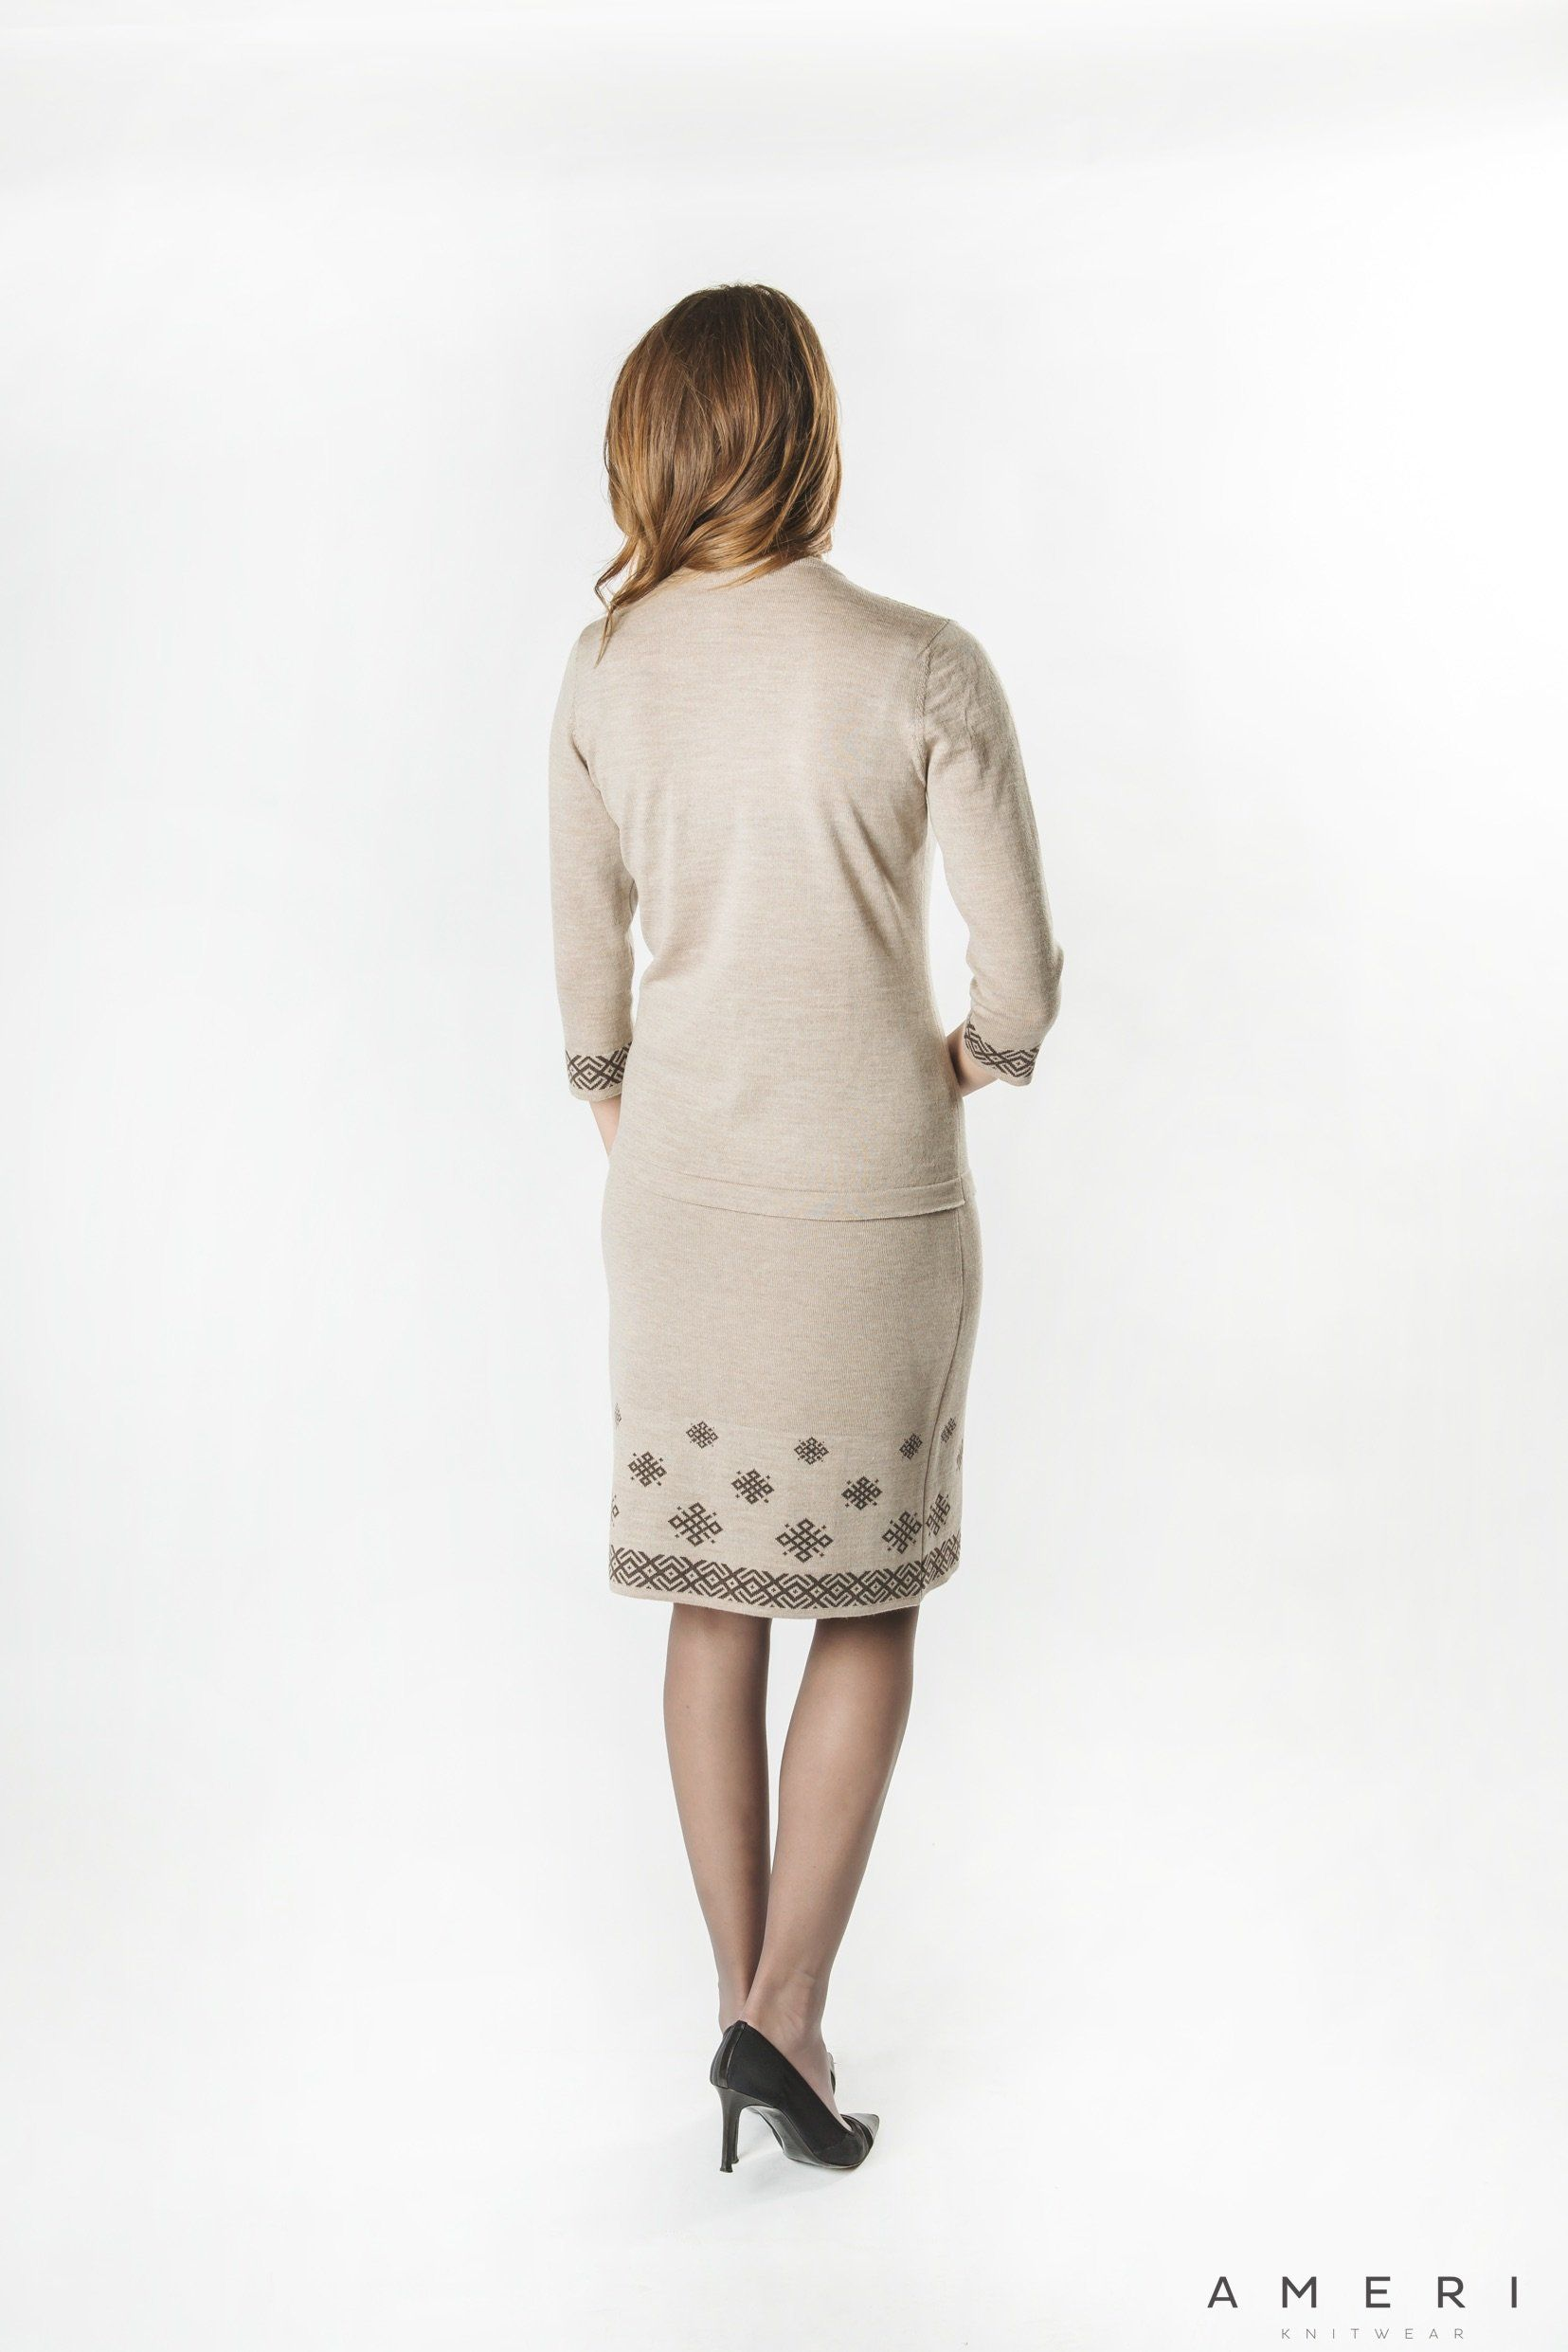 Džemperis ar tautisku ornamentu